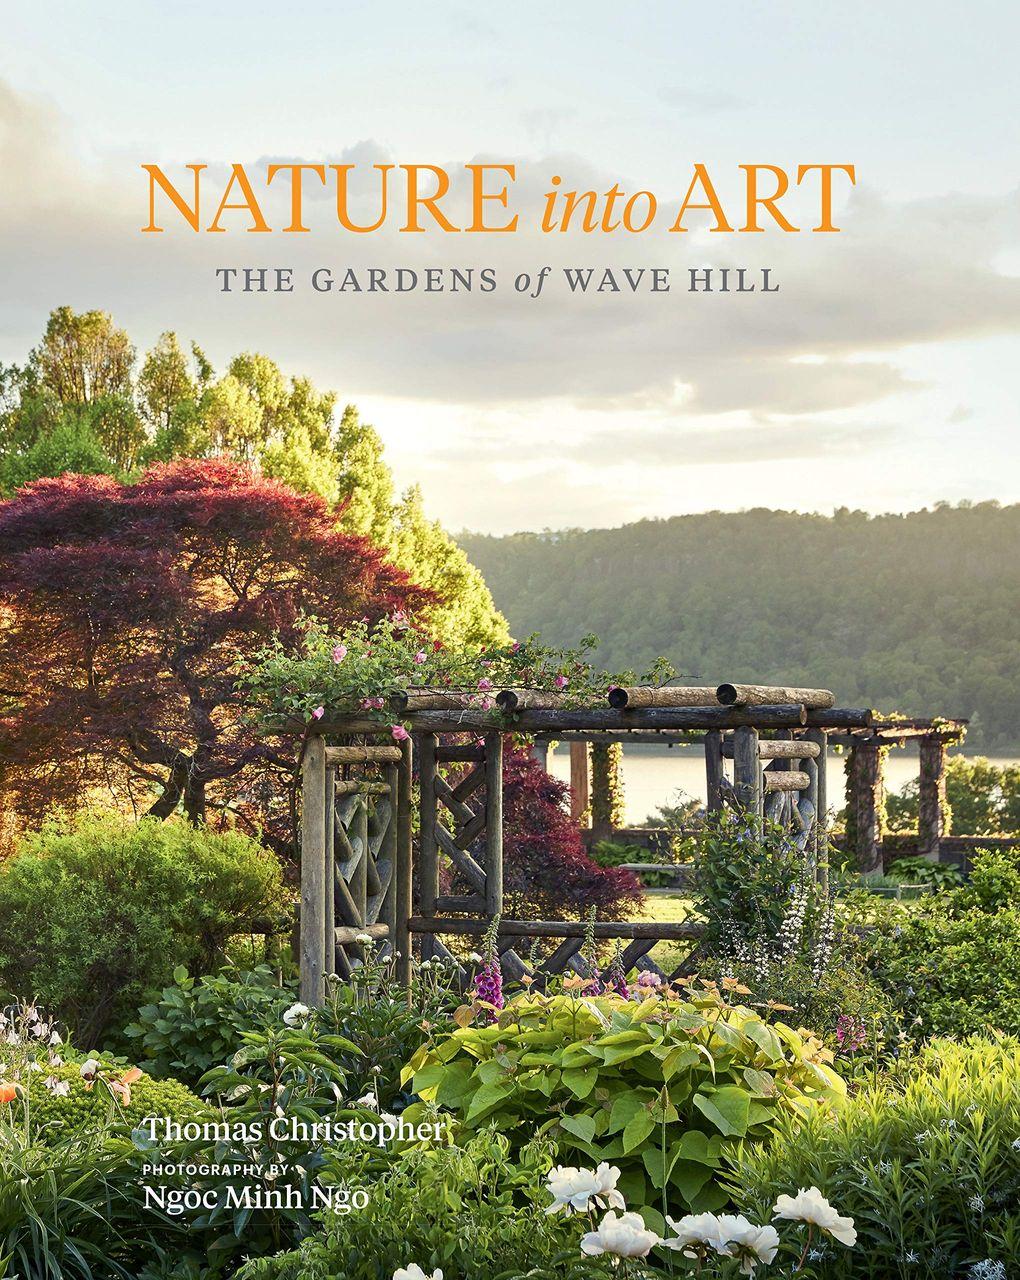 Nature into Art by Thomas Christopher and Ngoc Minh Ngo